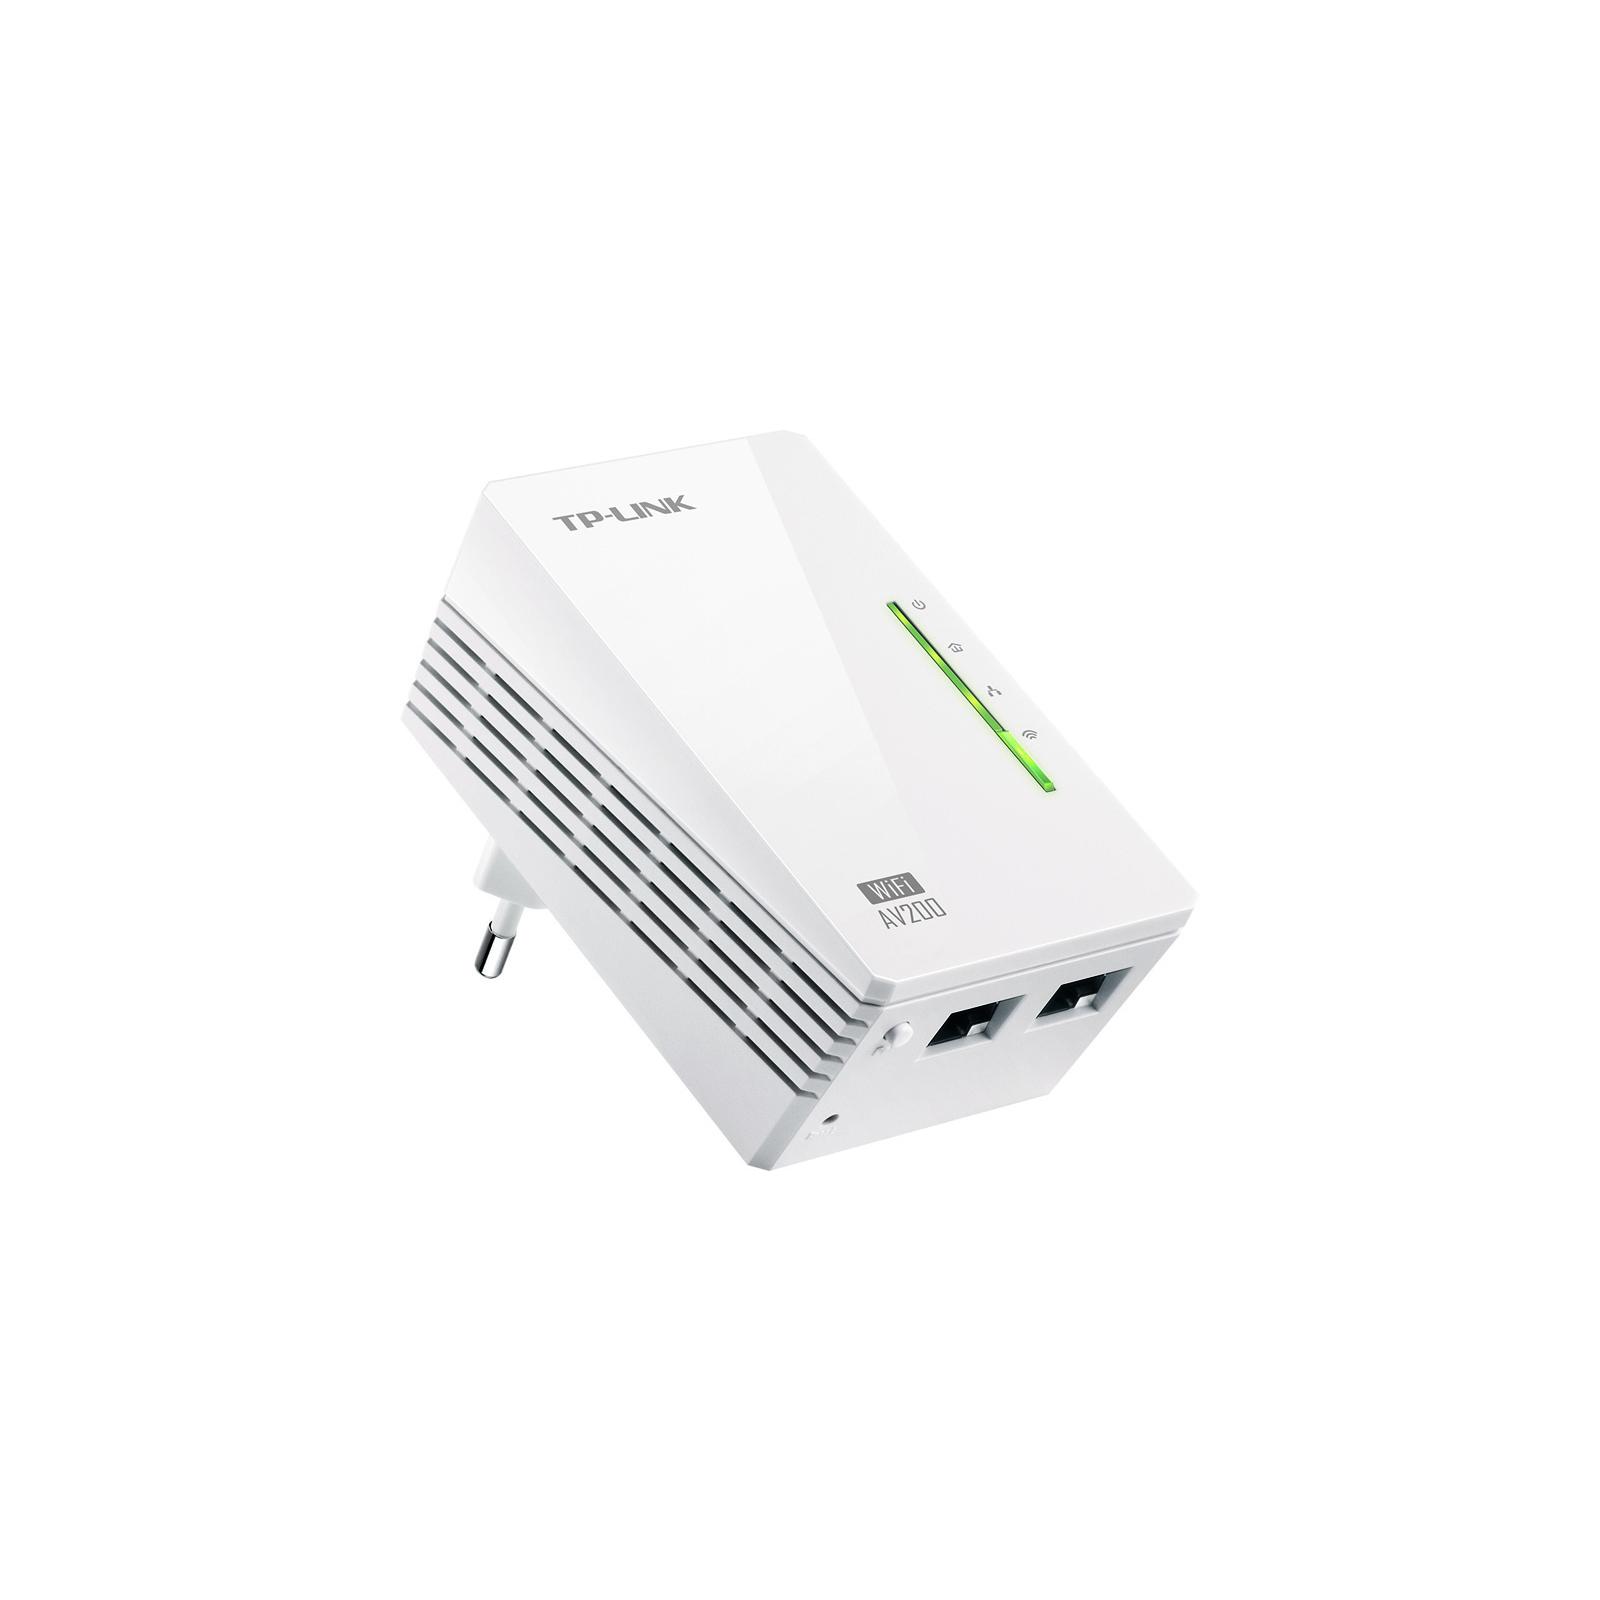 Адаптер Powerline TP-Link TL-WPA2220 KIT изображение 6